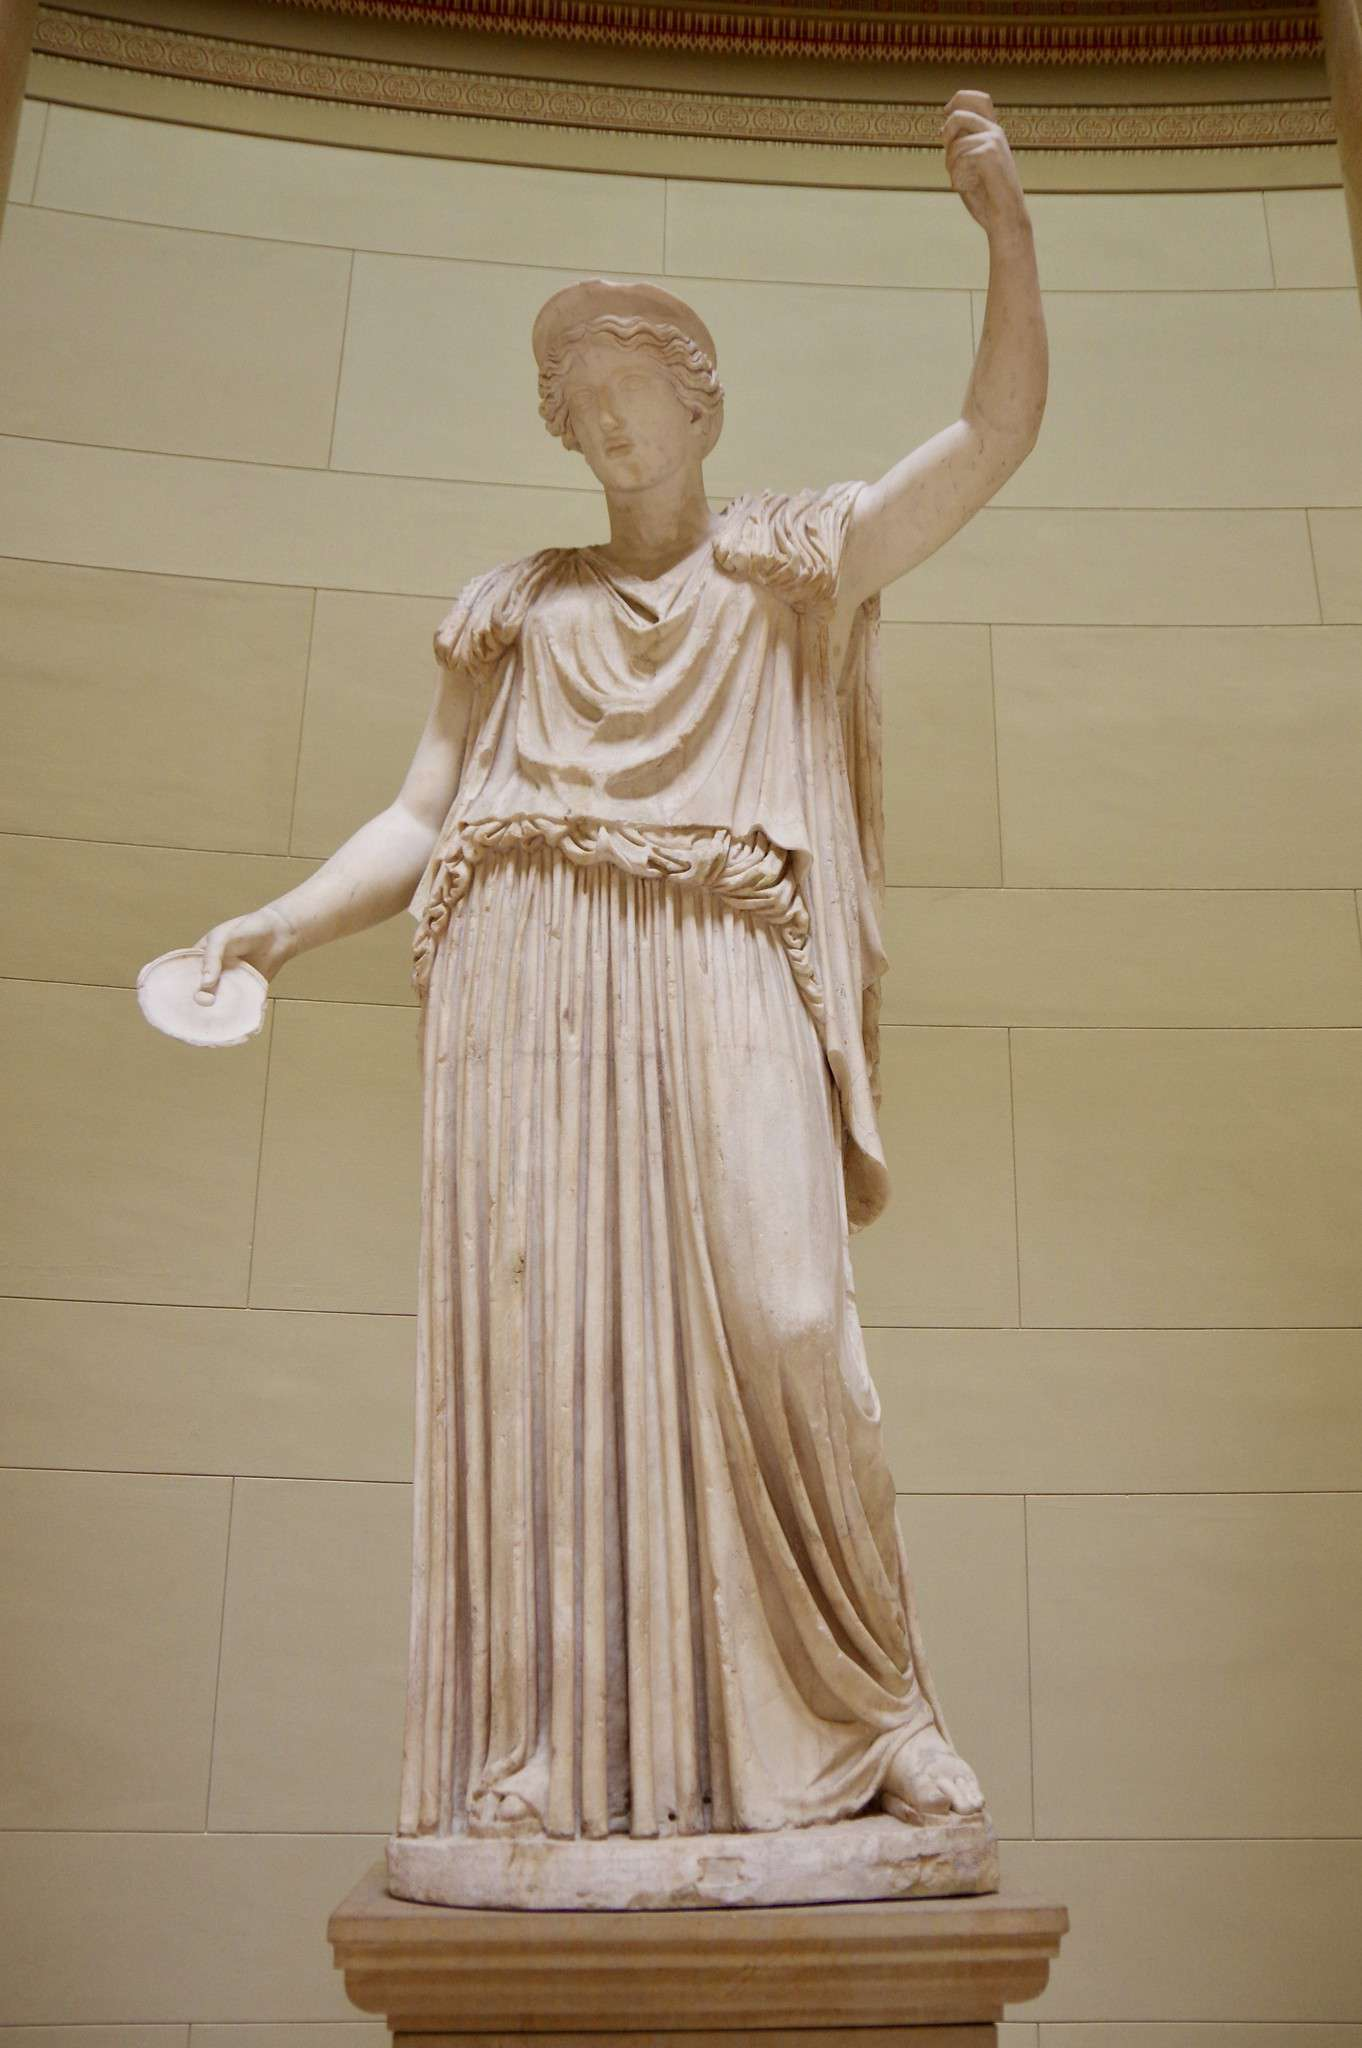 Hera, The Rotunda, Altes Museum, Berlin, Germany